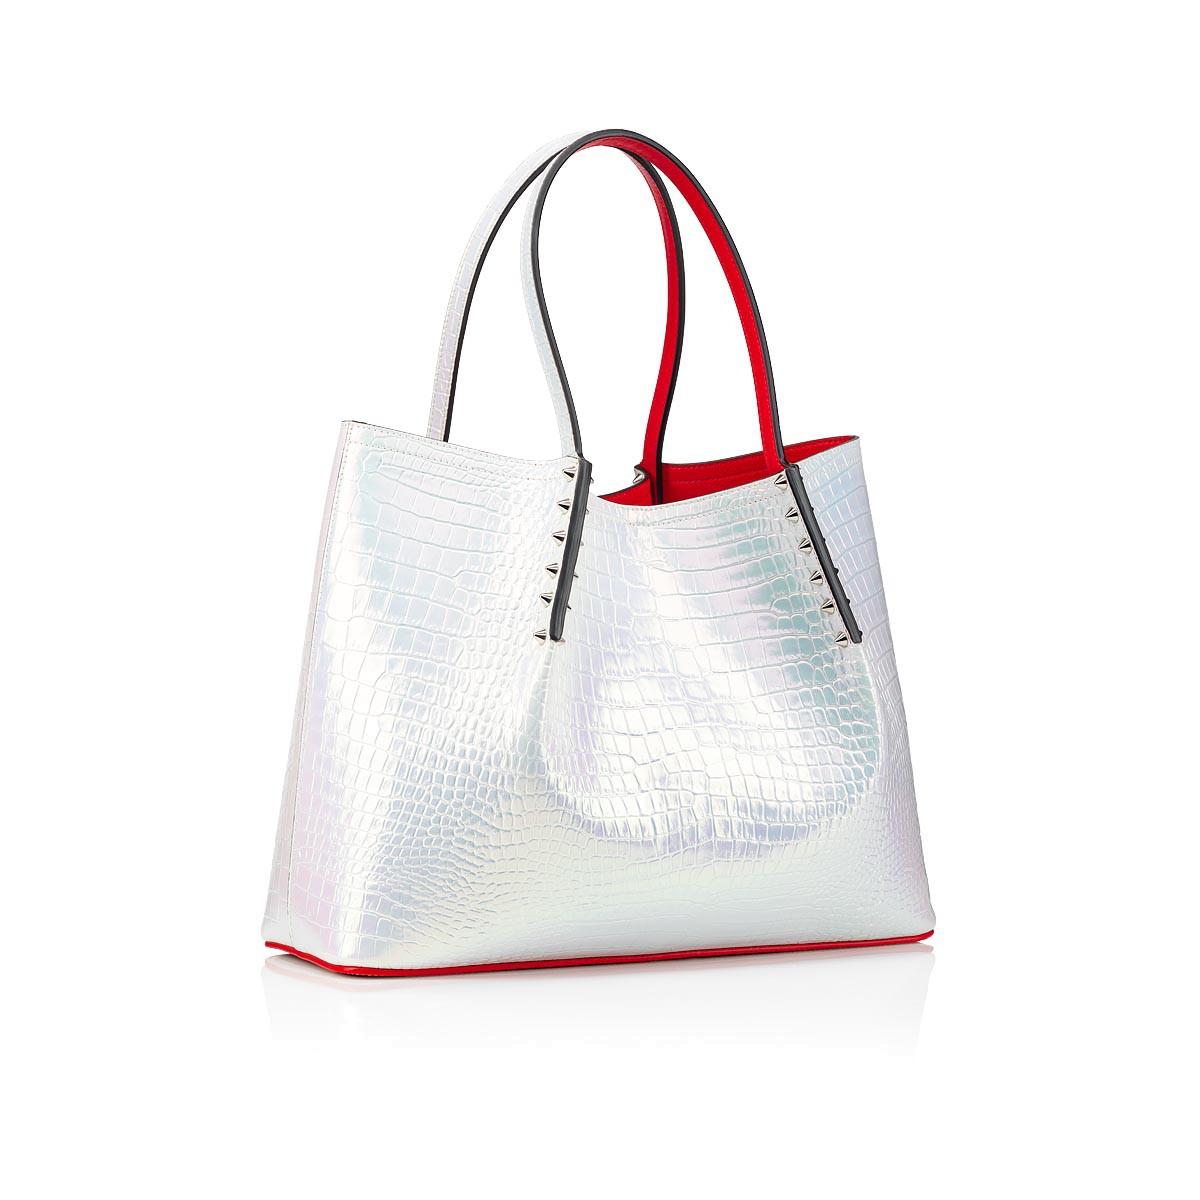 Bags - Cabarock Small Tote Bag - Christian Louboutin